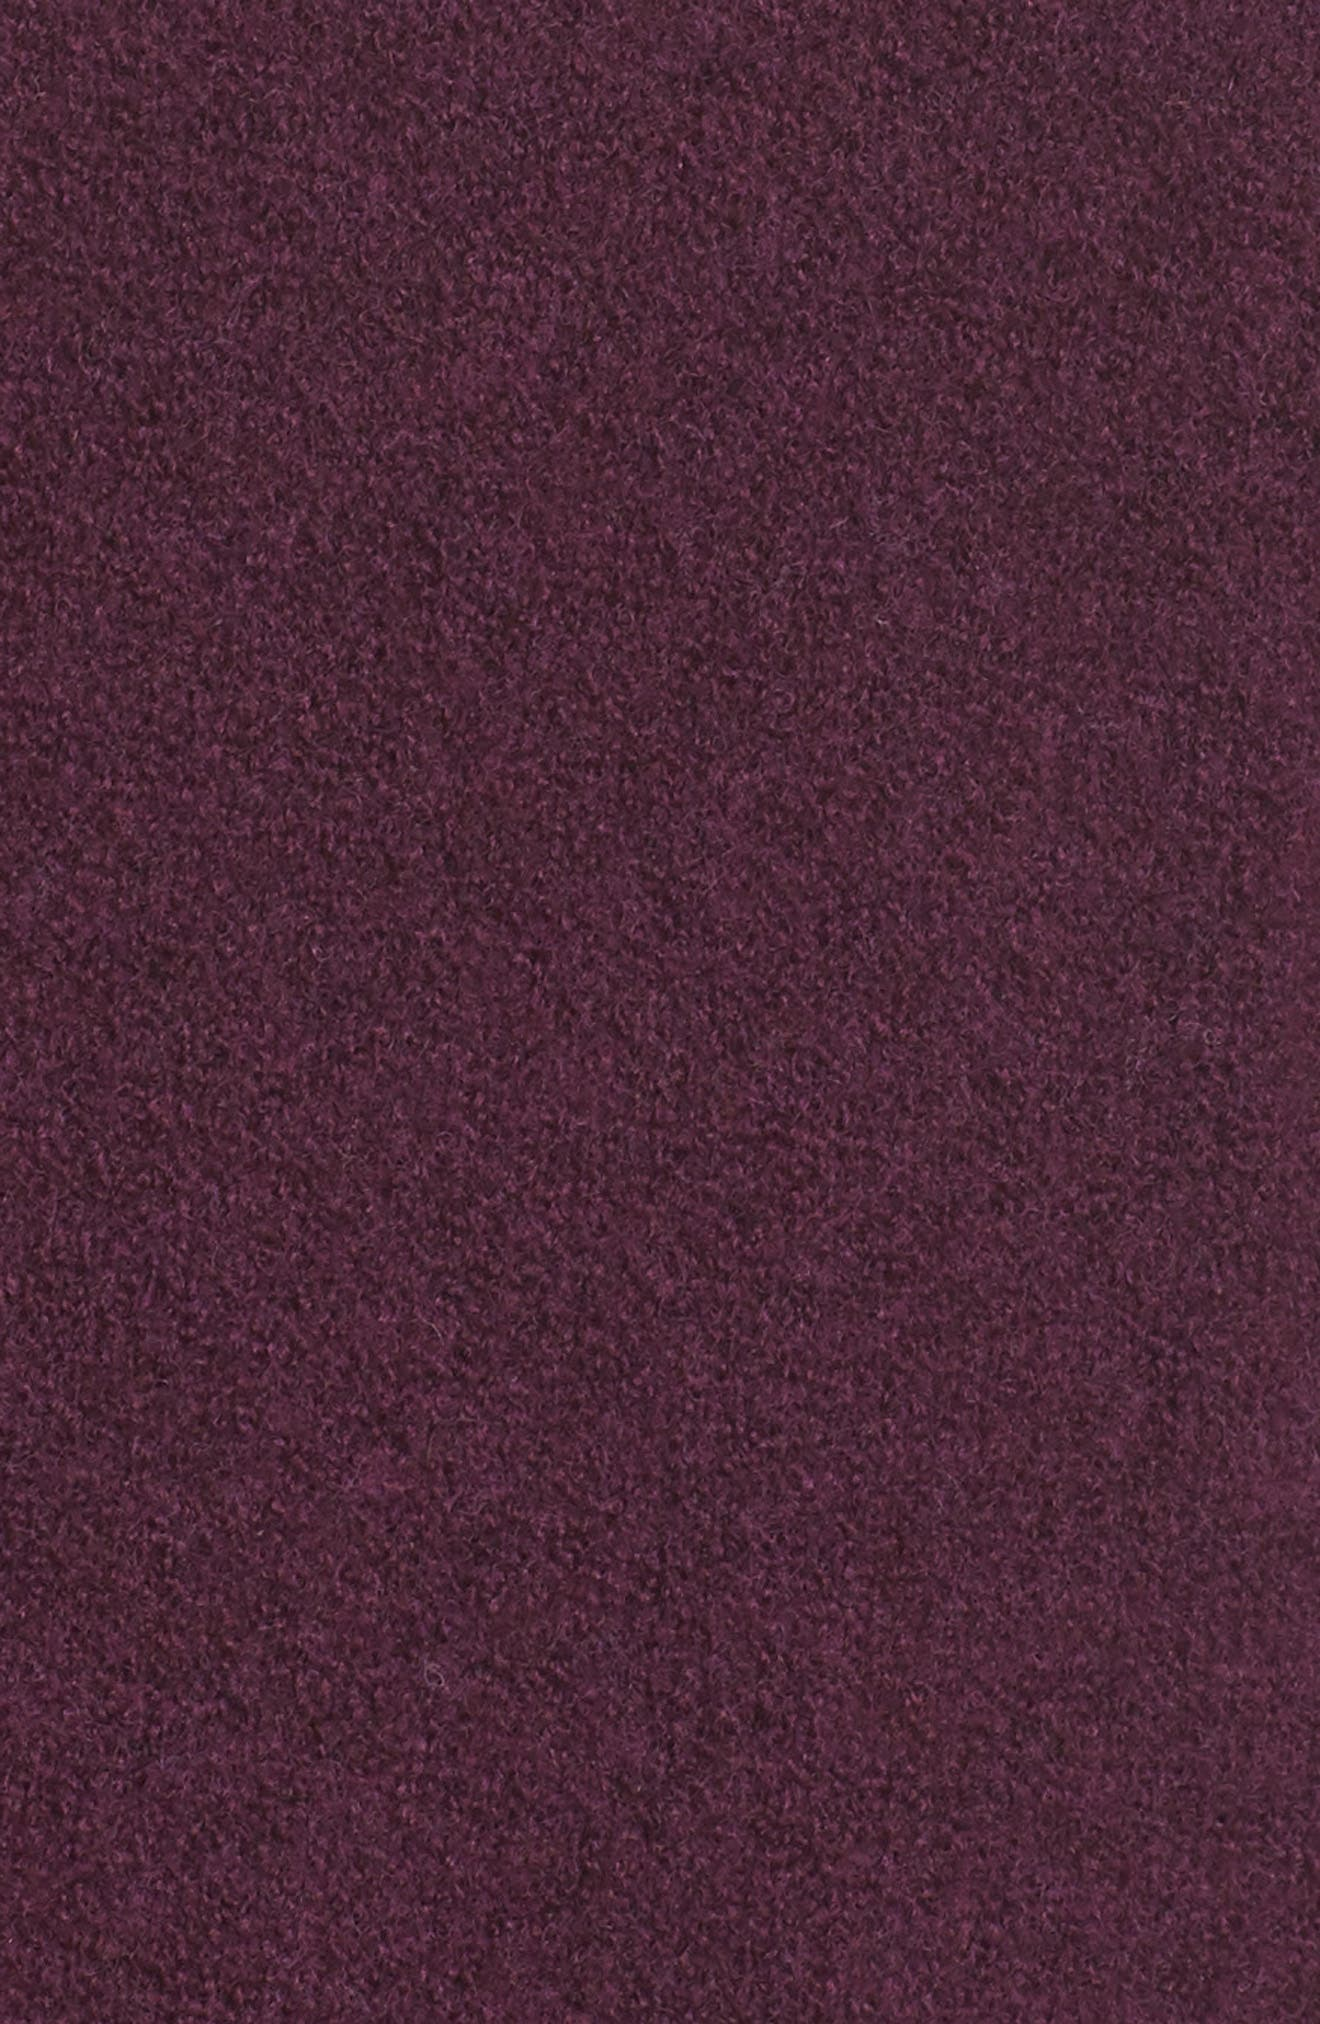 Hooded Cardigan,                             Alternate thumbnail 6, color,                             Purple Potent